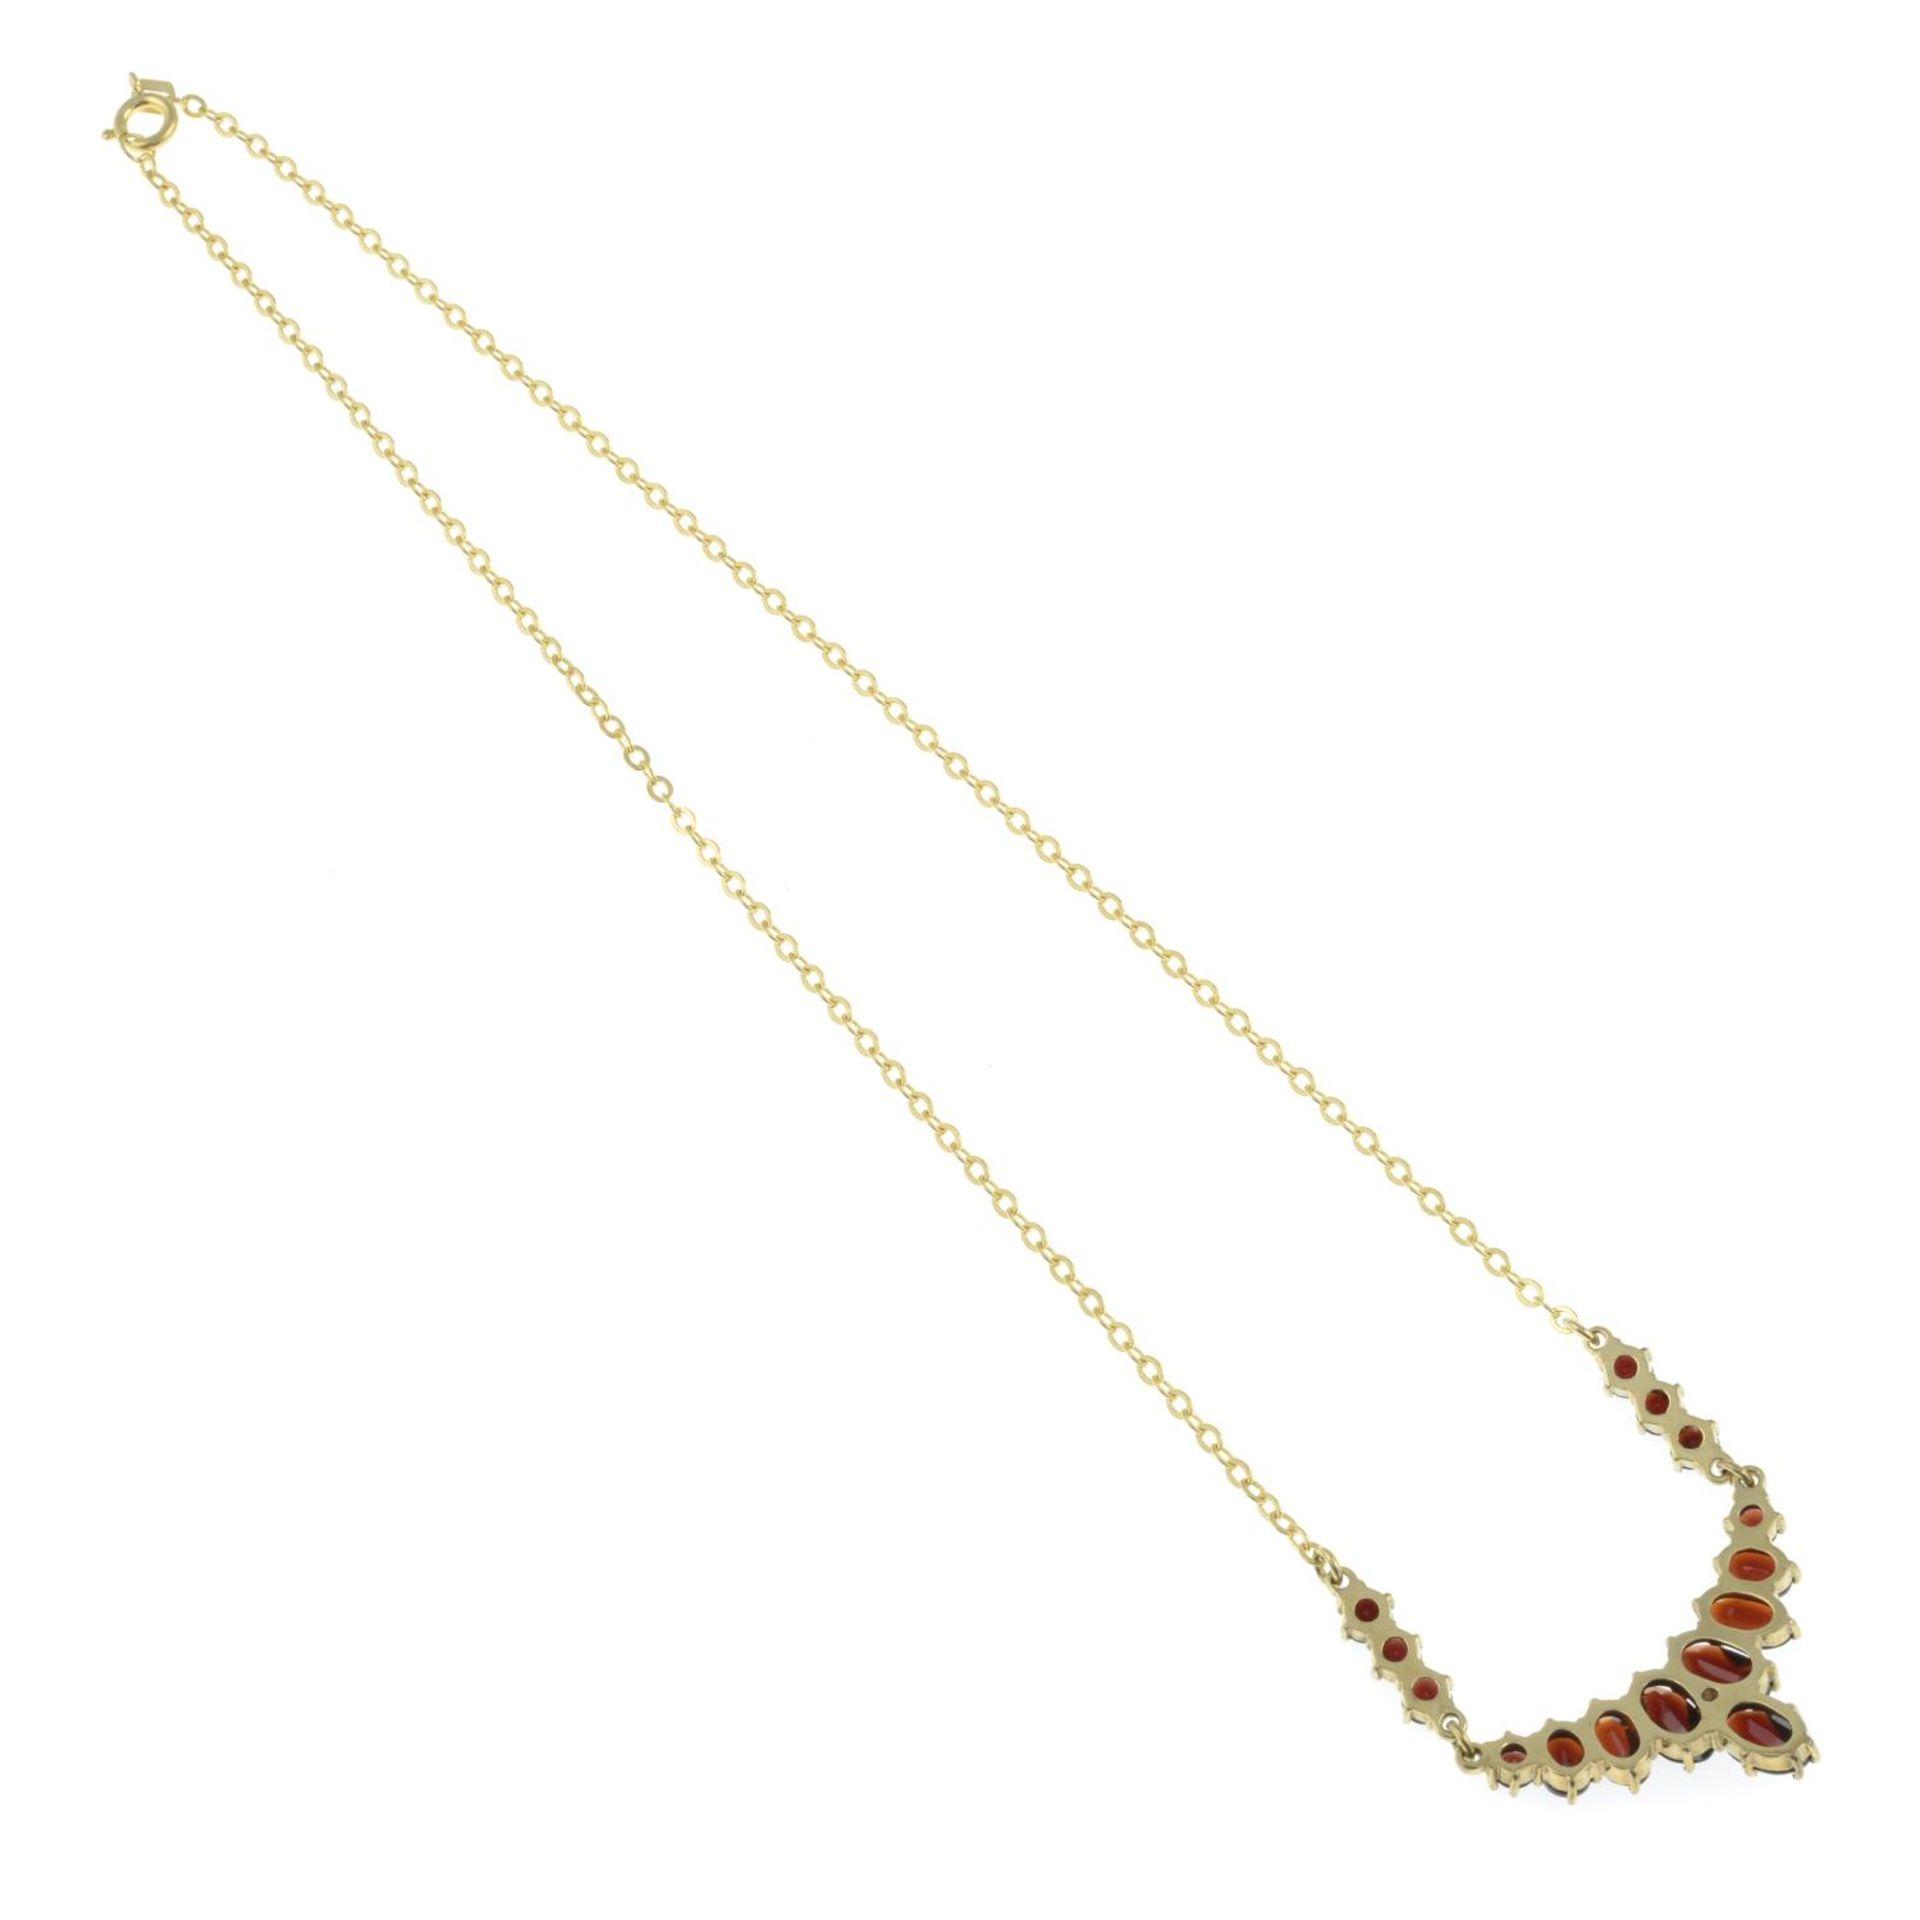 A bohemian garnet necklace. - Image 2 of 2